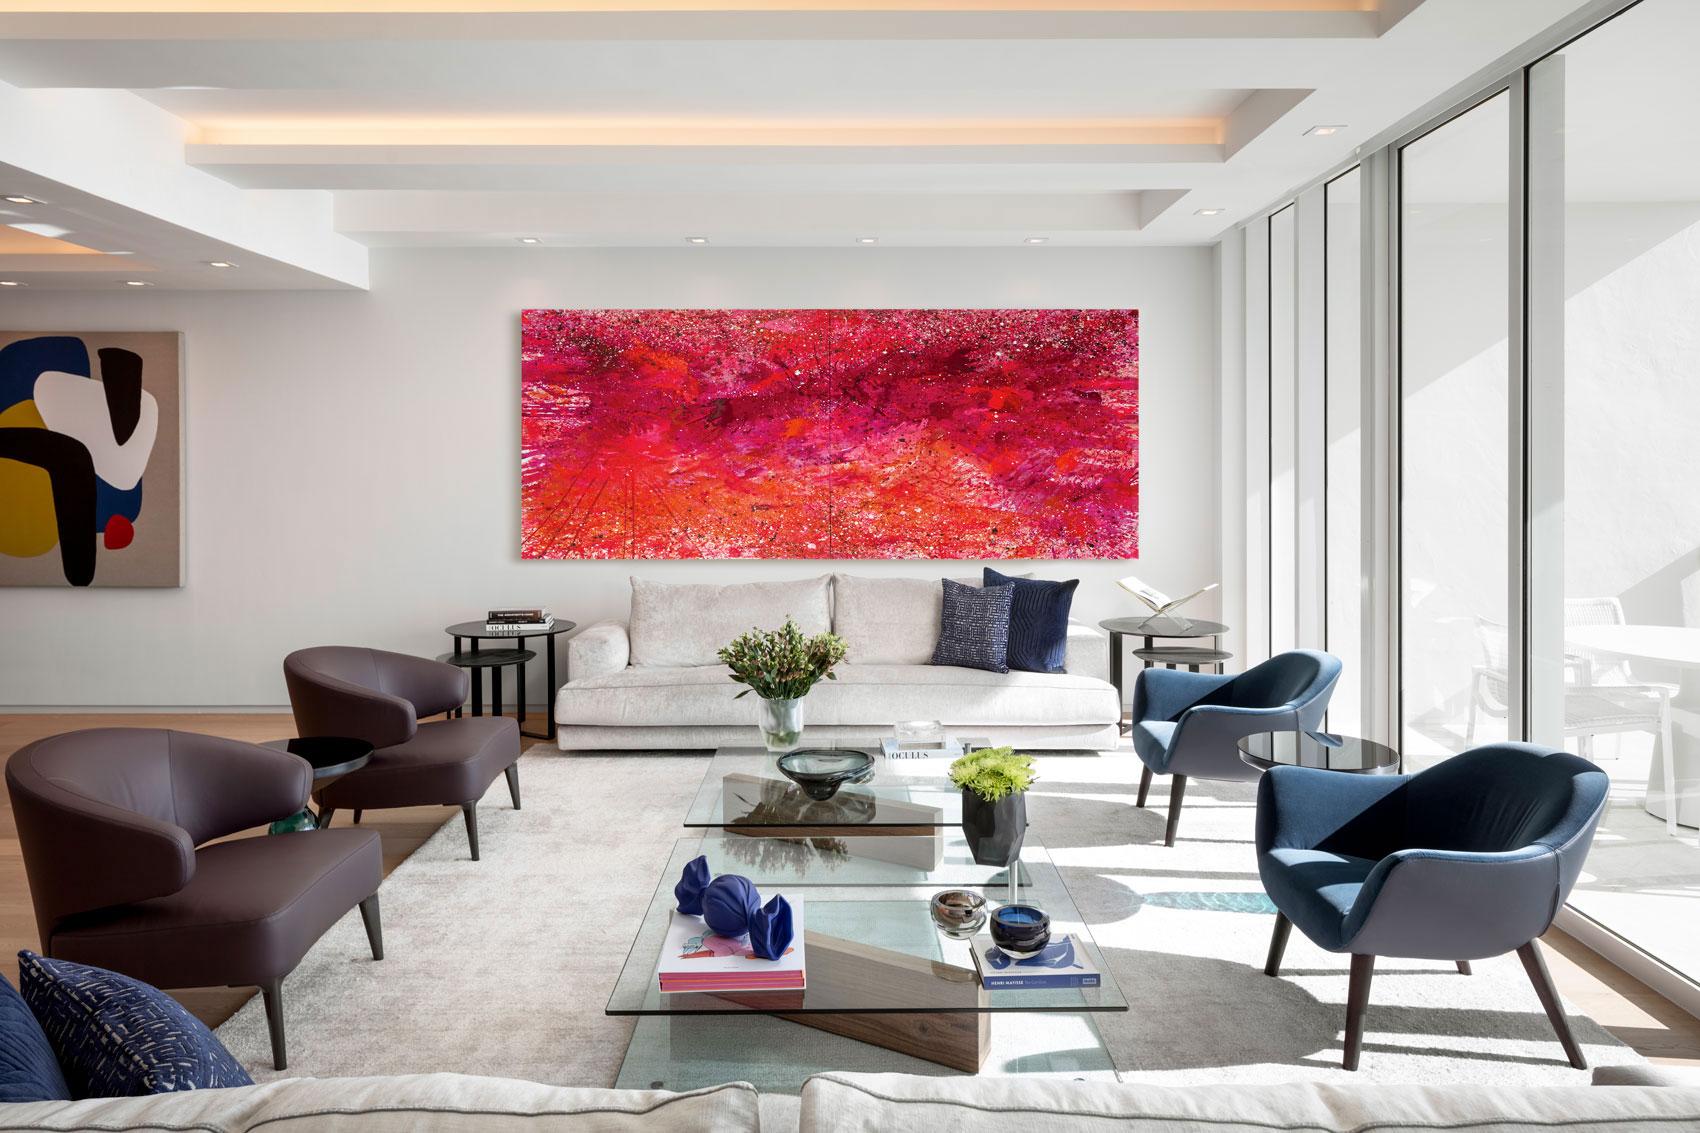 City apartment total renovation by Tamara Feldman